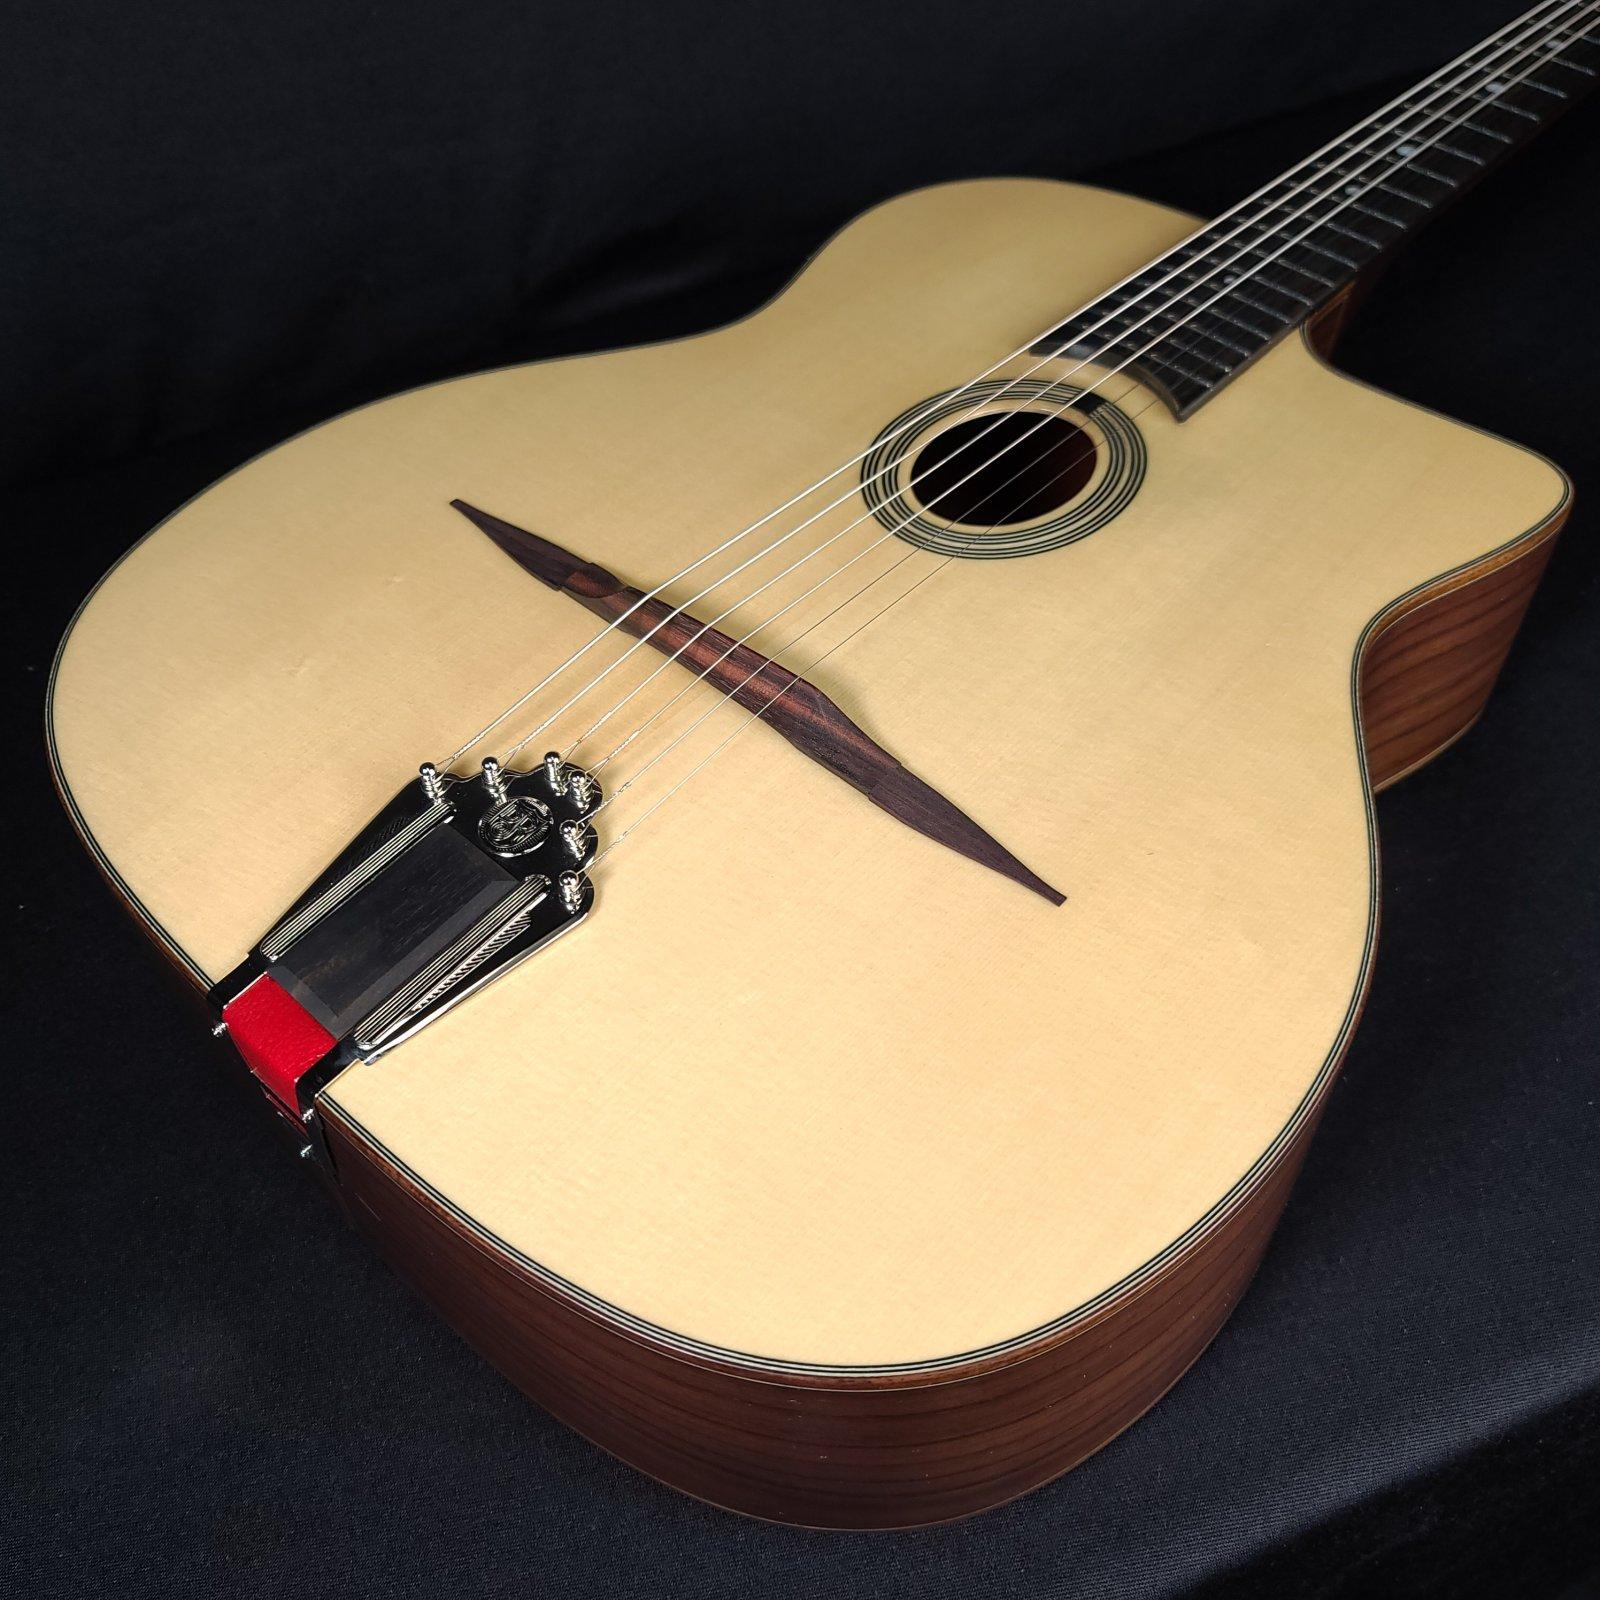 Eastman DM1 Natural Gypsy Jazz Guitar Petite Bouche w/ Gig Bag